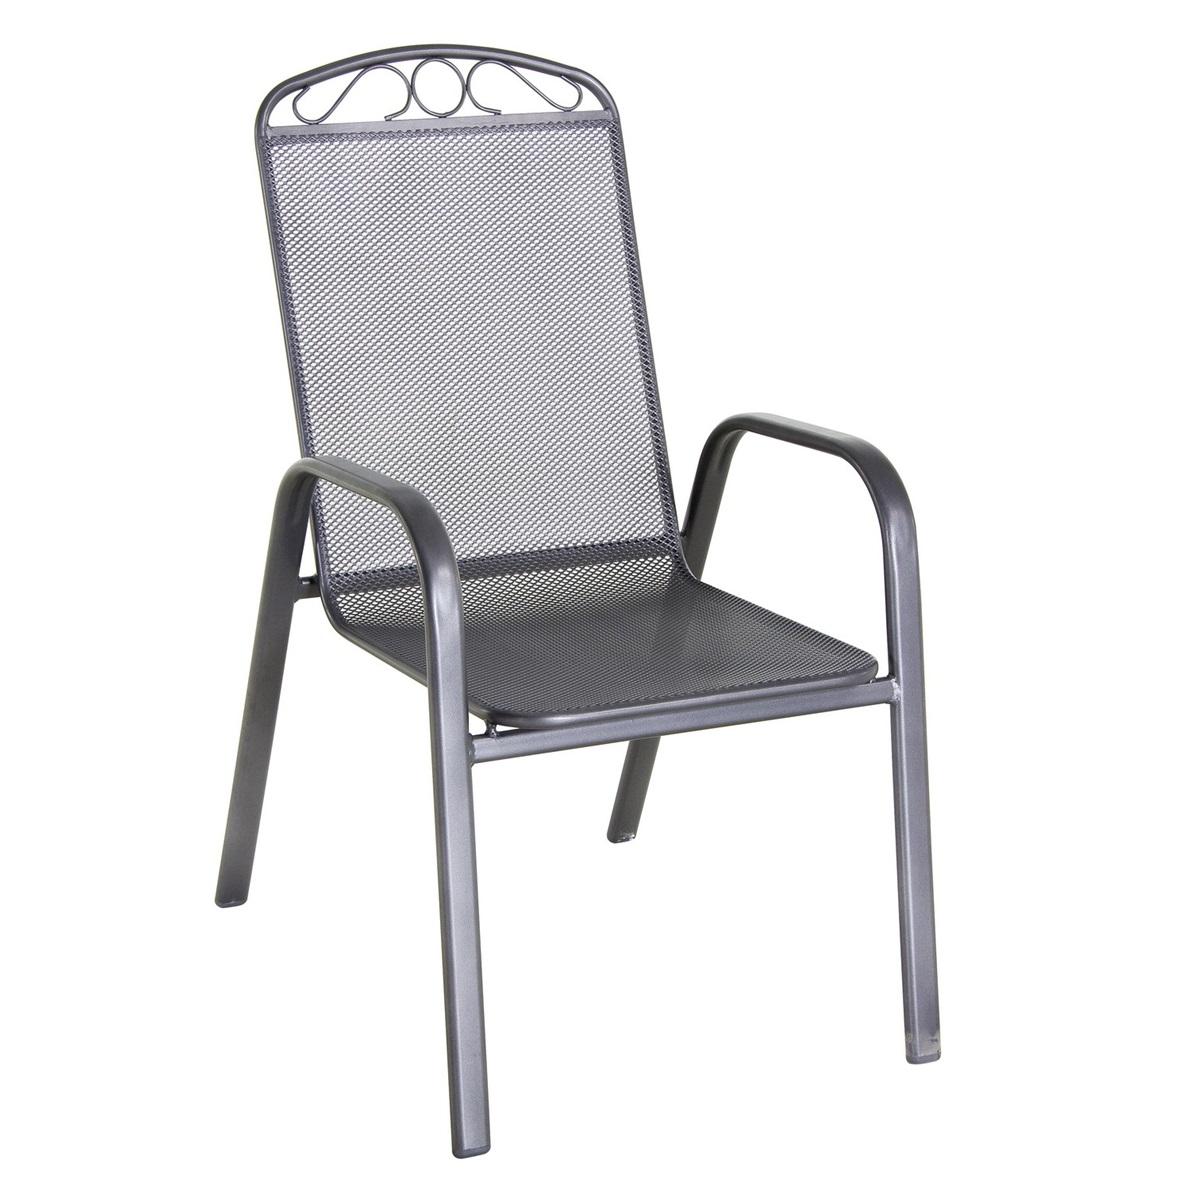 stohovatelná židle z tahokovu 71 x 56 x 99 cm Creador Klasik